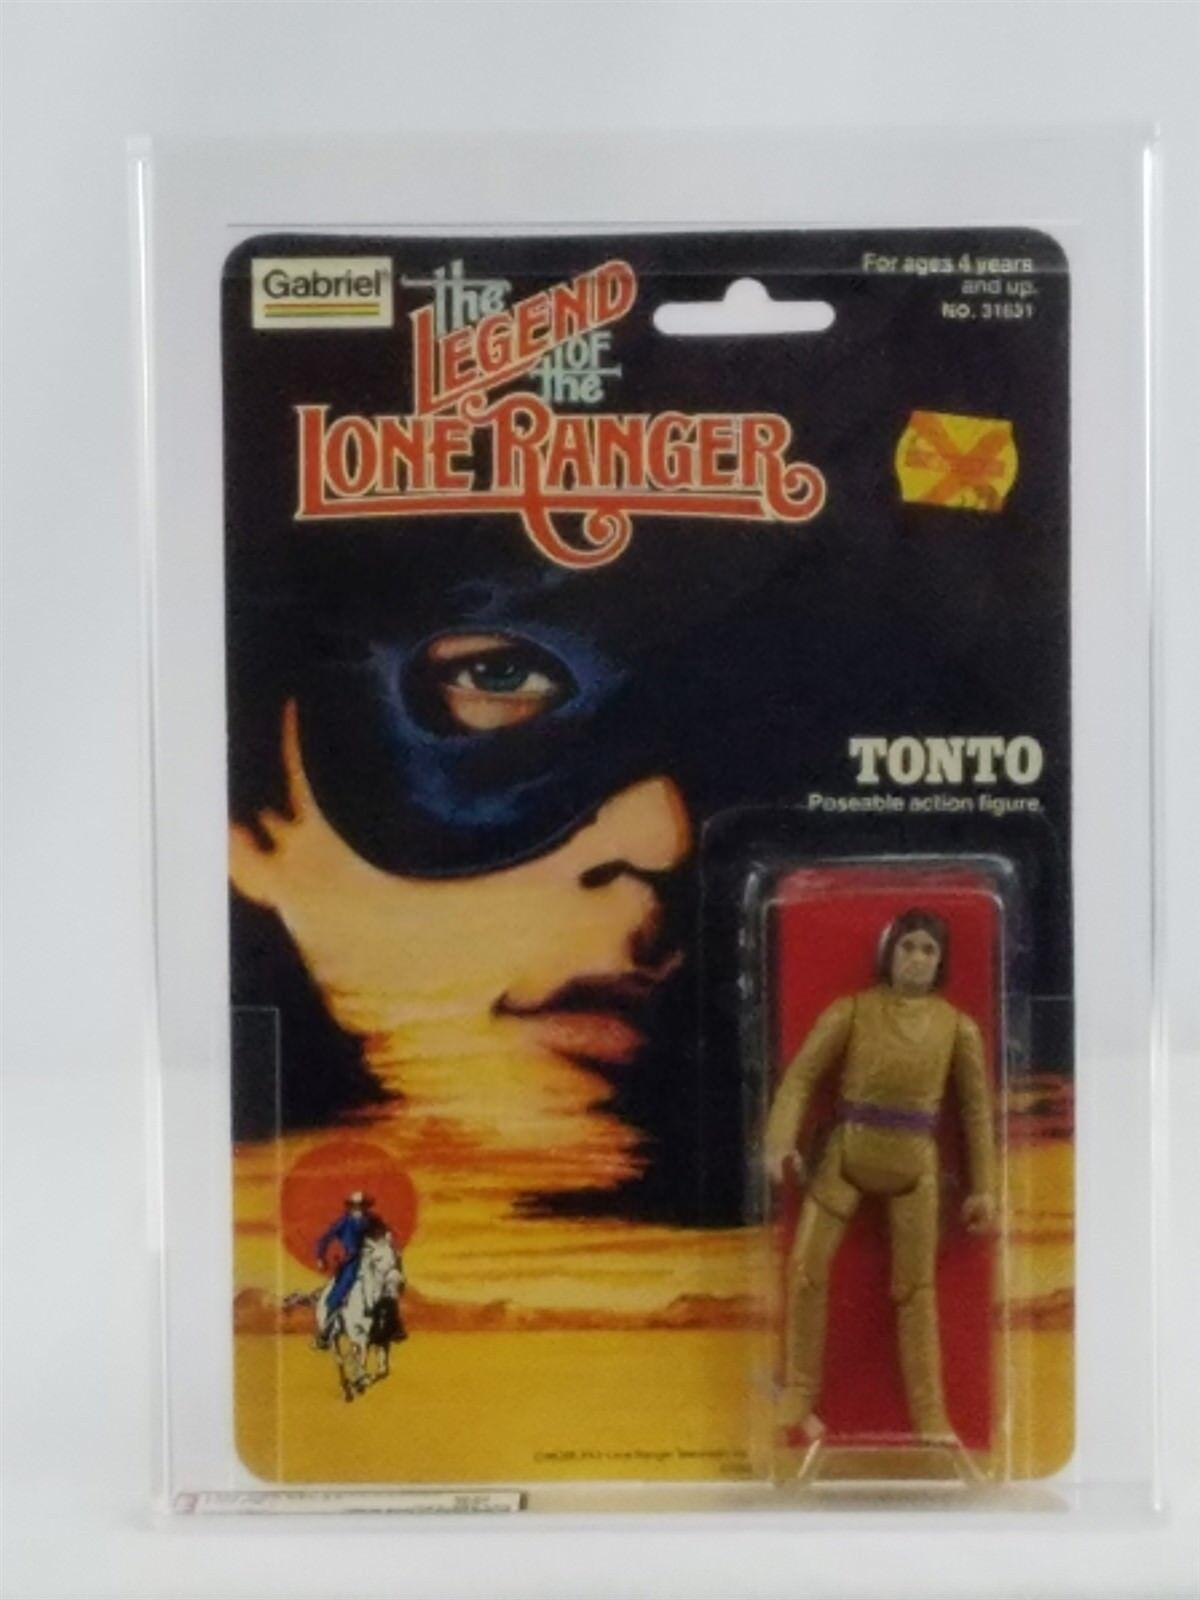 THE LEGEND OF THE LONE RANGER TONTO 1980 GABRIEL NM AFA 80